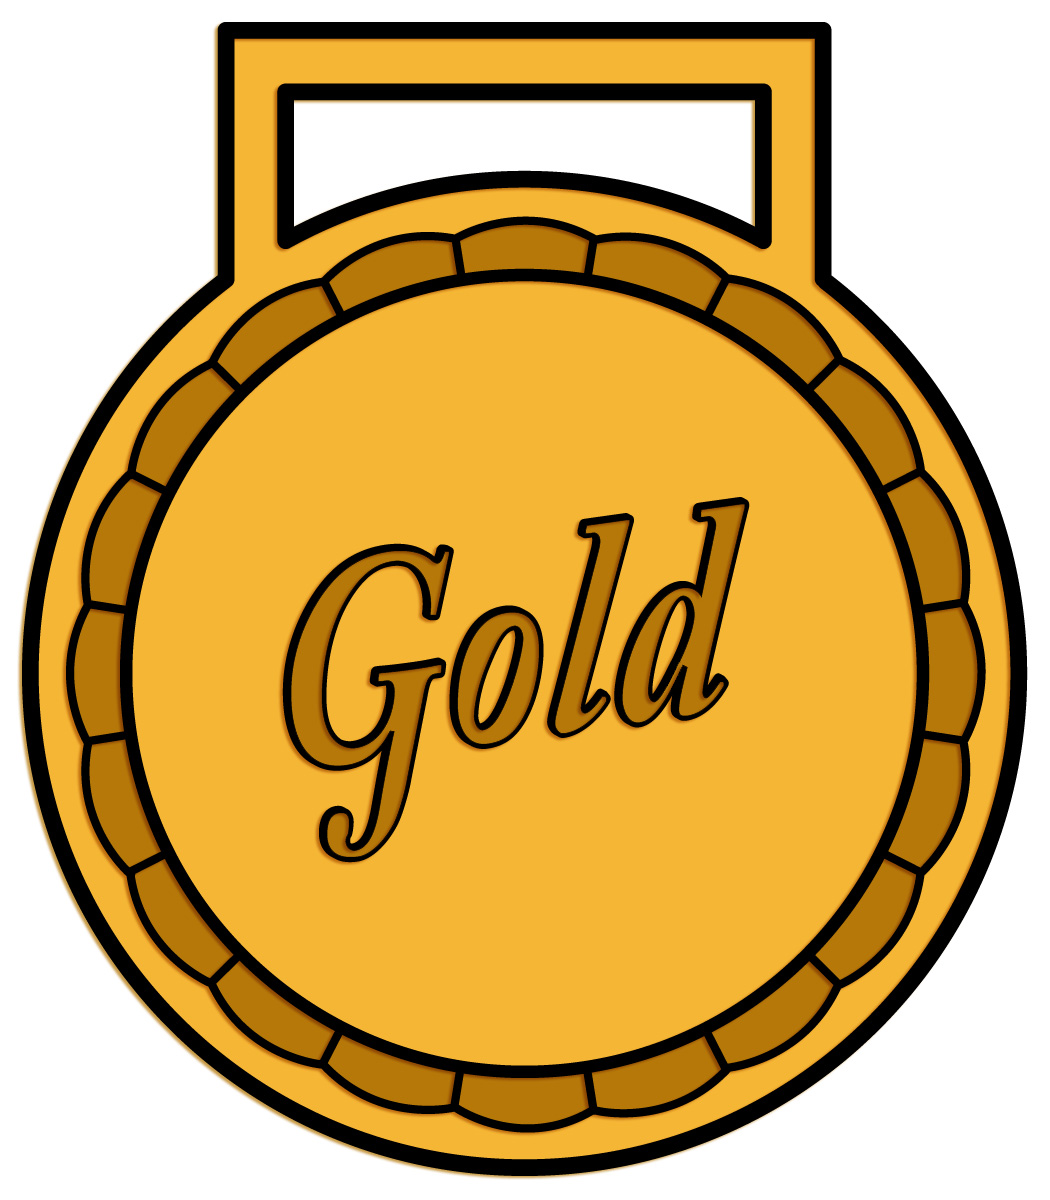 1050x1200 Trophy Clipart Awards Banquet